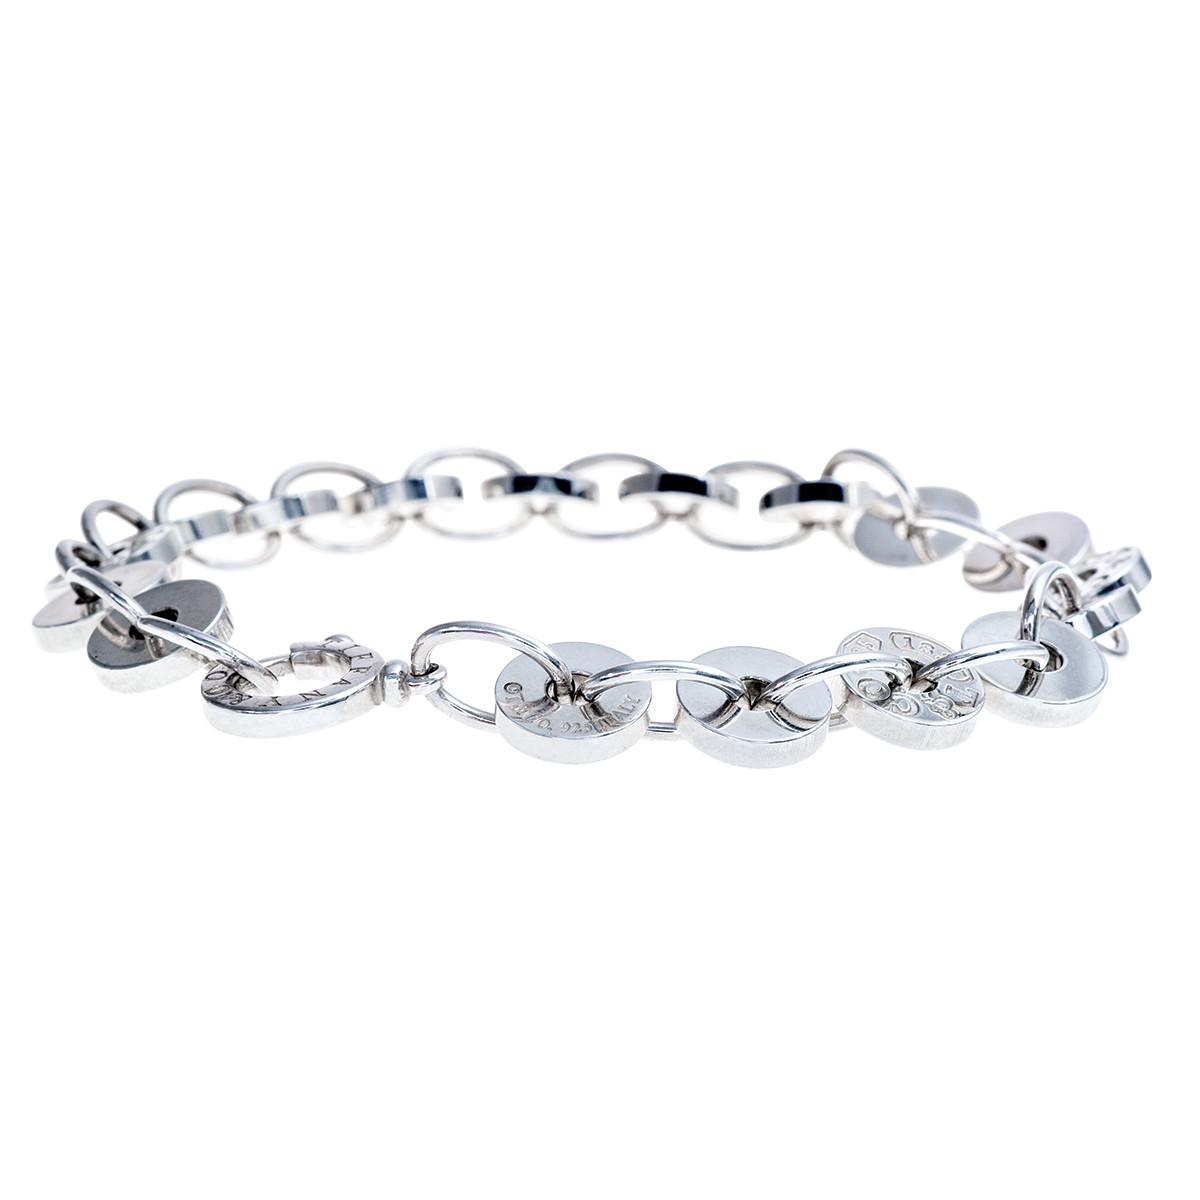 Vintage Tiffany & Co. 1837 Circle Bracelet